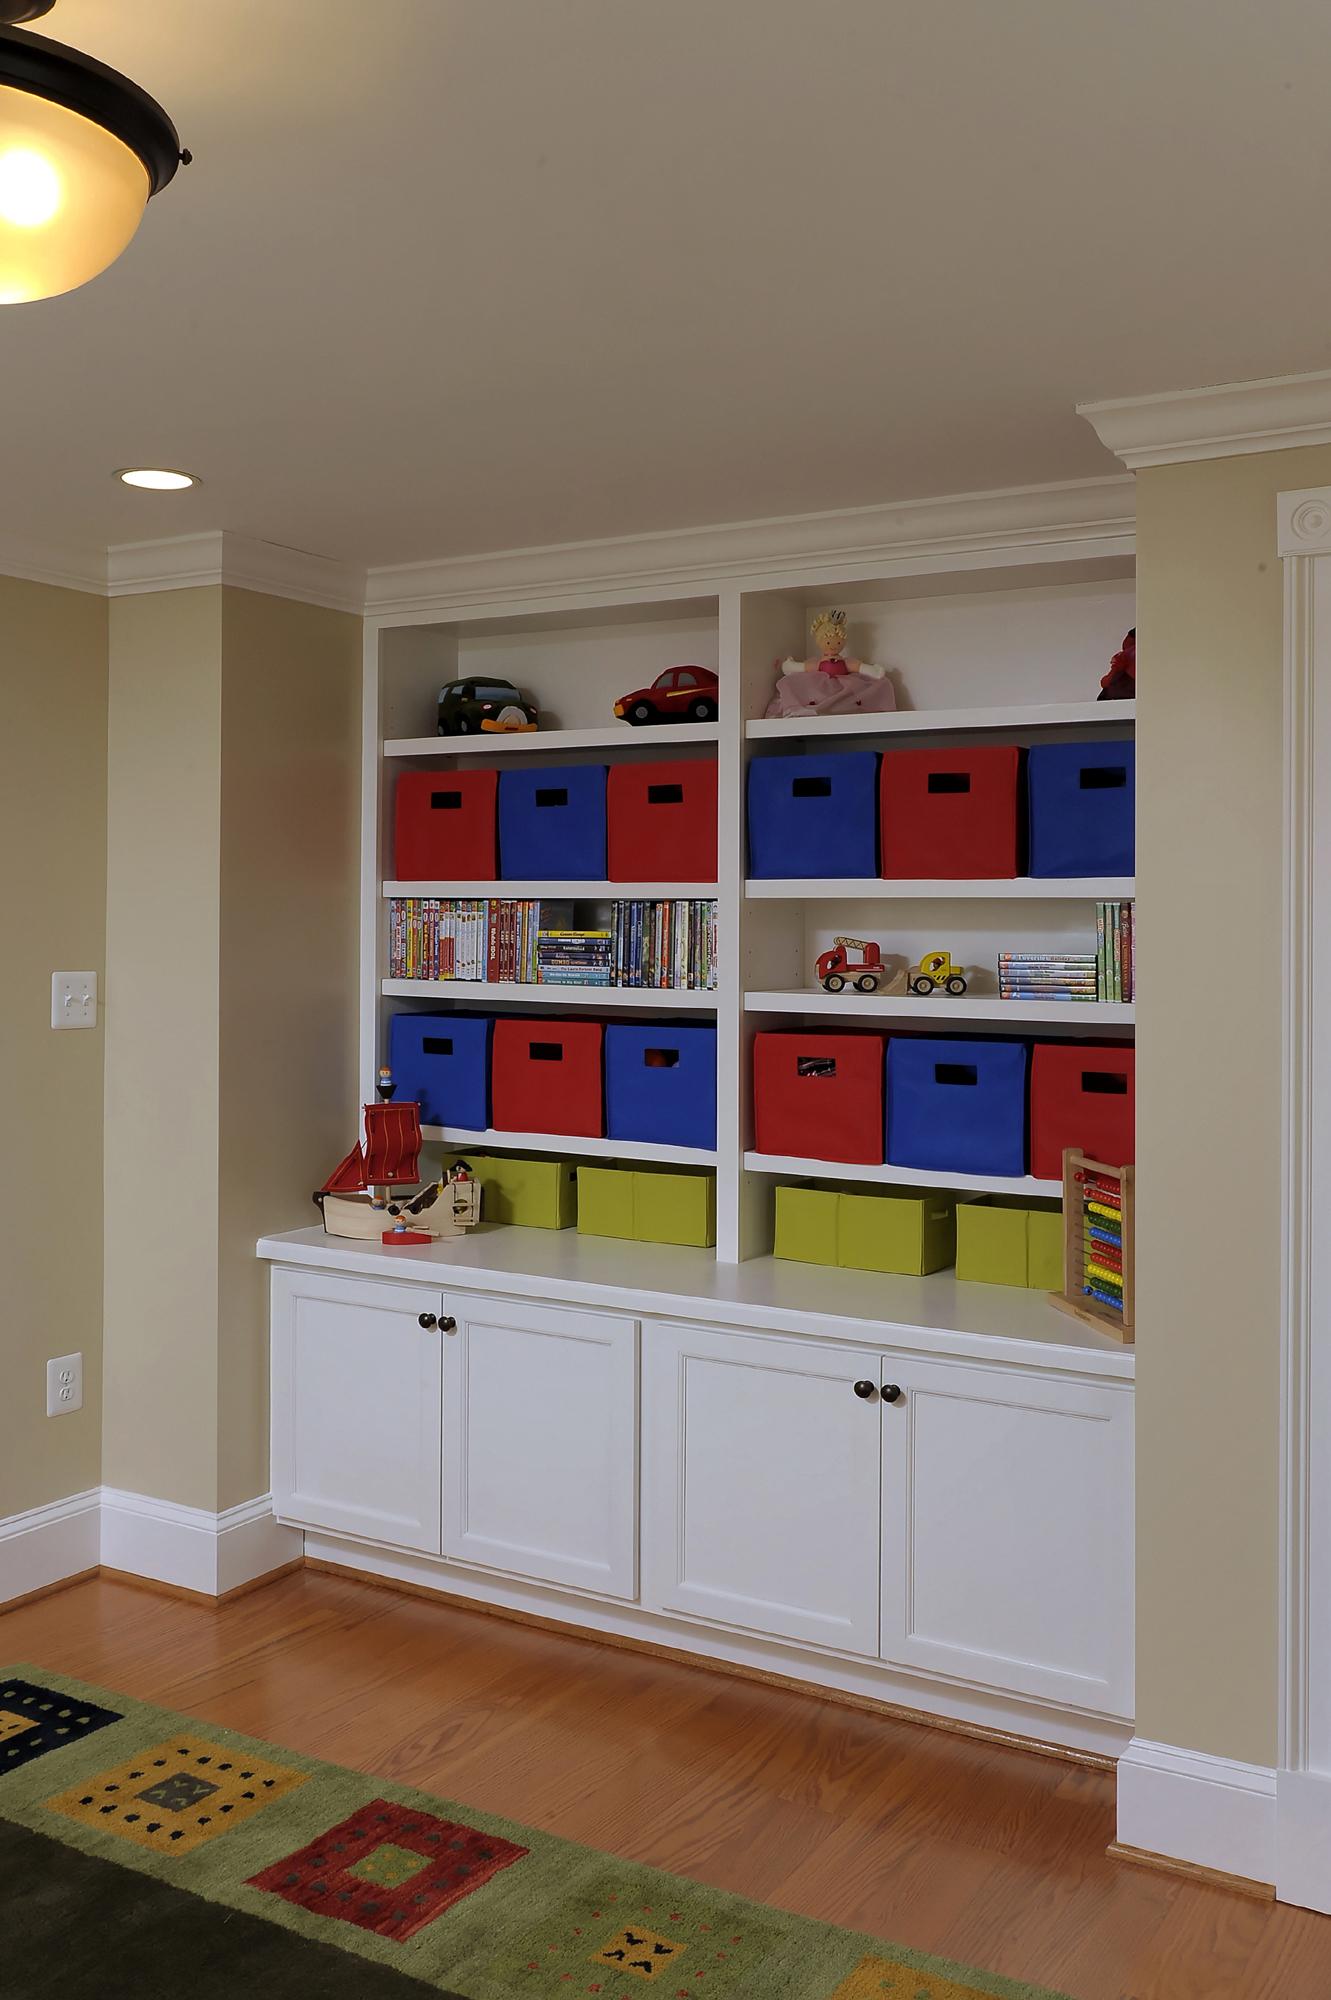 Room cabinet design ideas. storage ideas how tos for closets ...